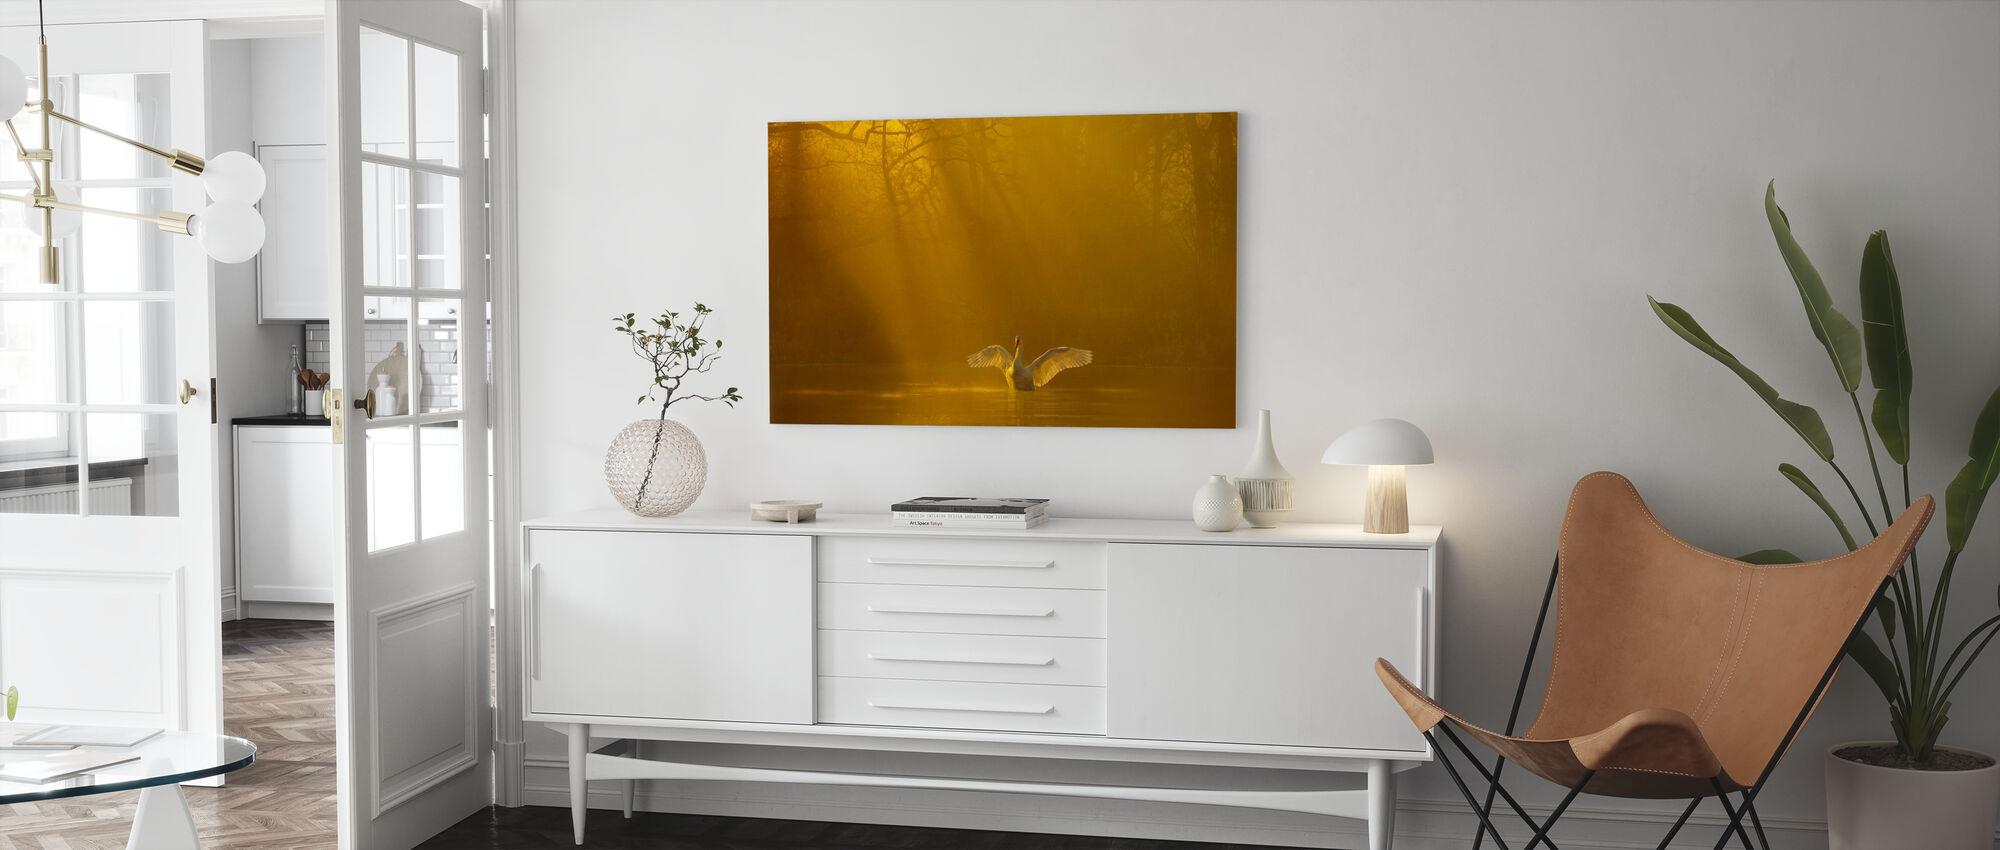 Gyllene Swan Lake - Canvastavla - Vardagsrum